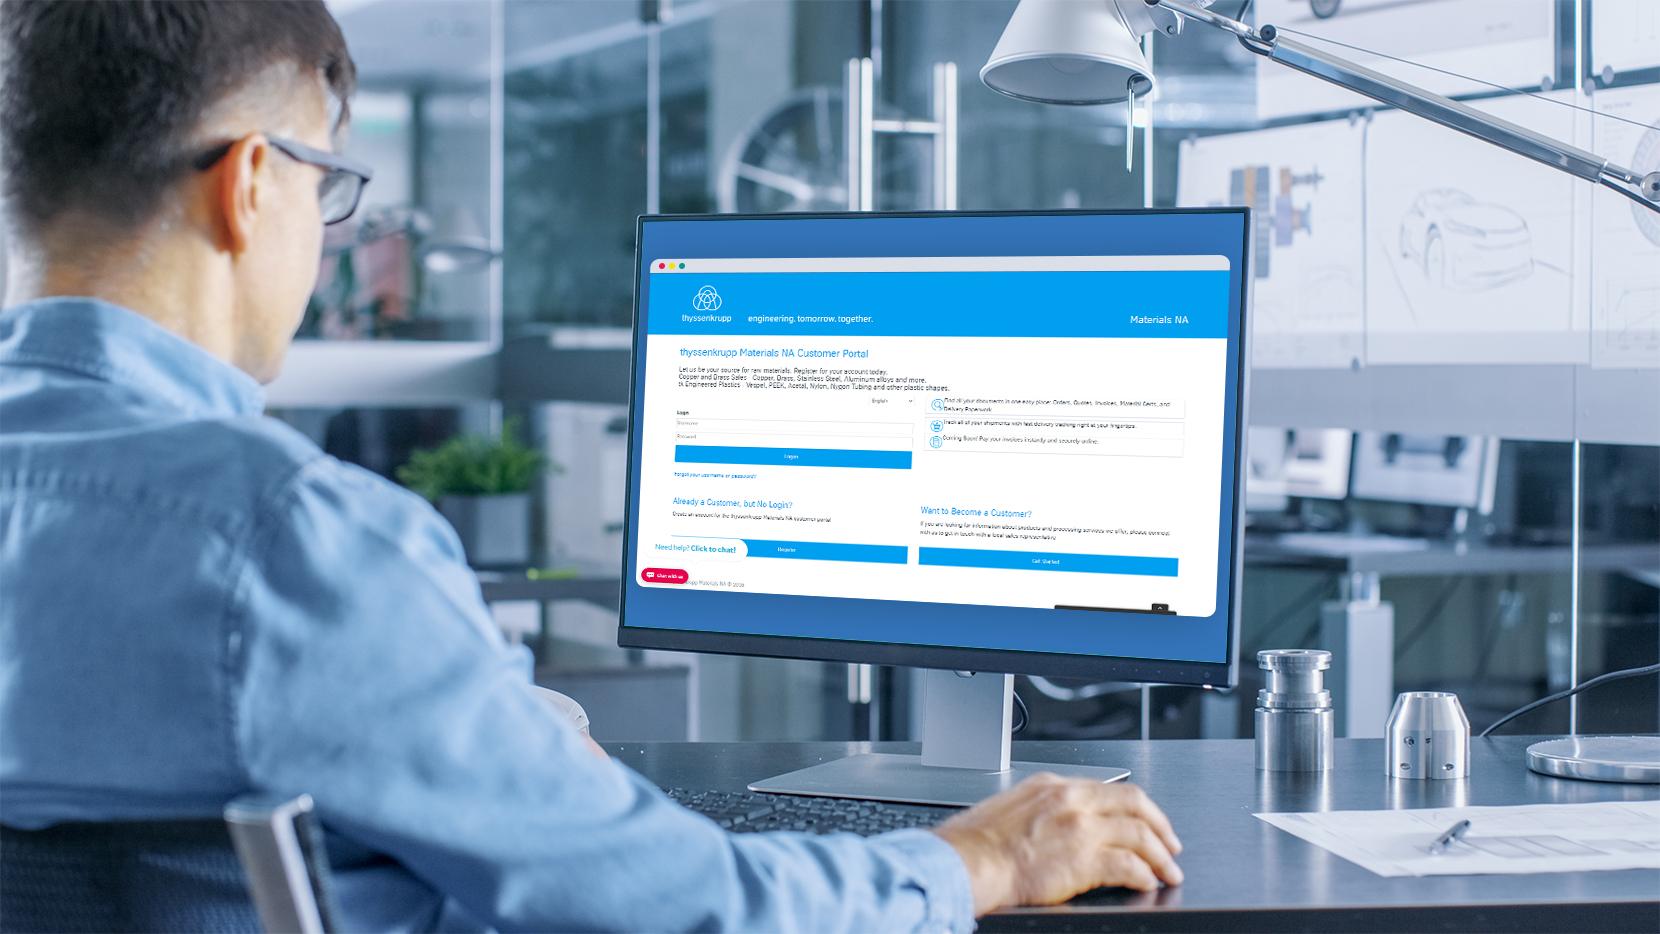 tkep-new-customer-portal